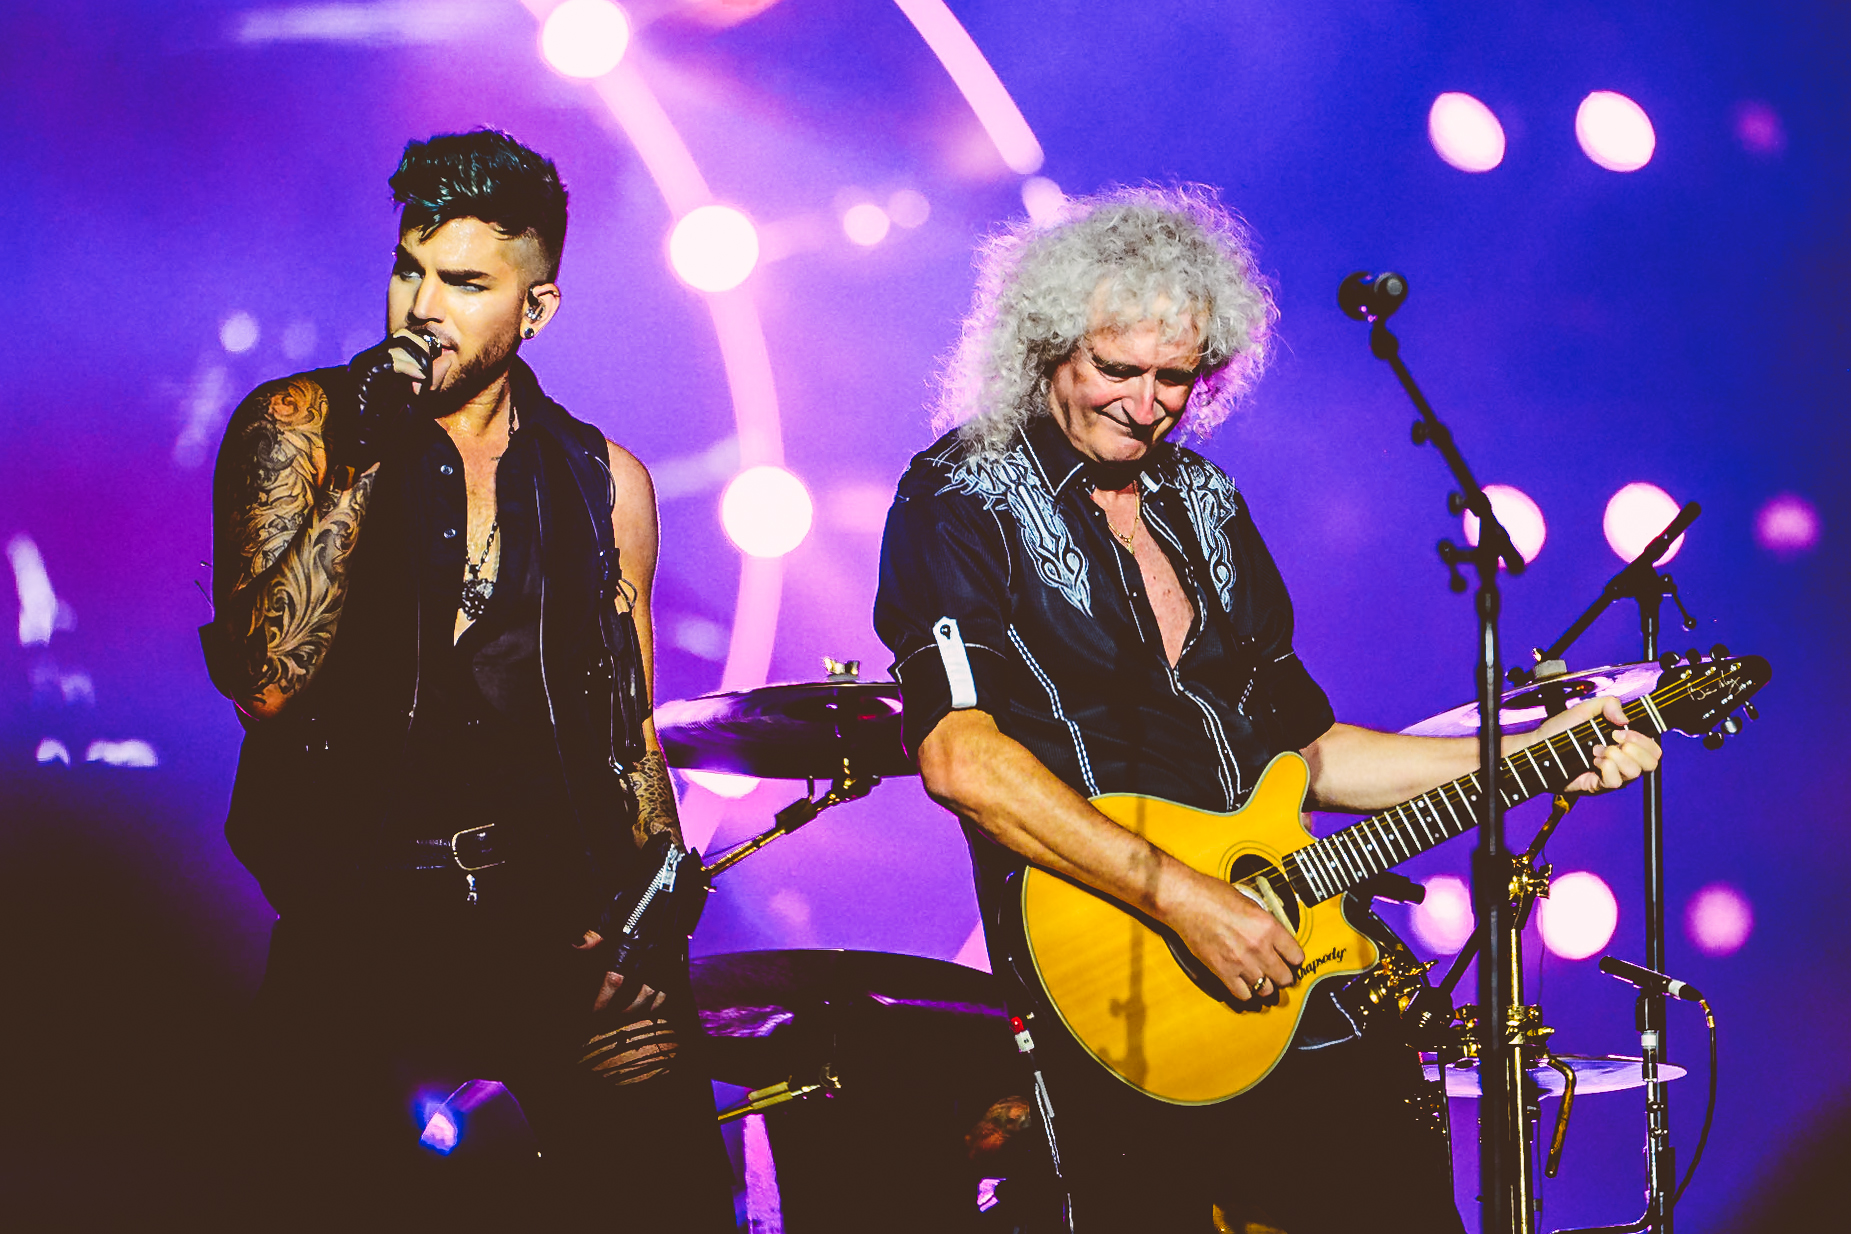 Adam Lambert & Brian May (Queen) /Singapore